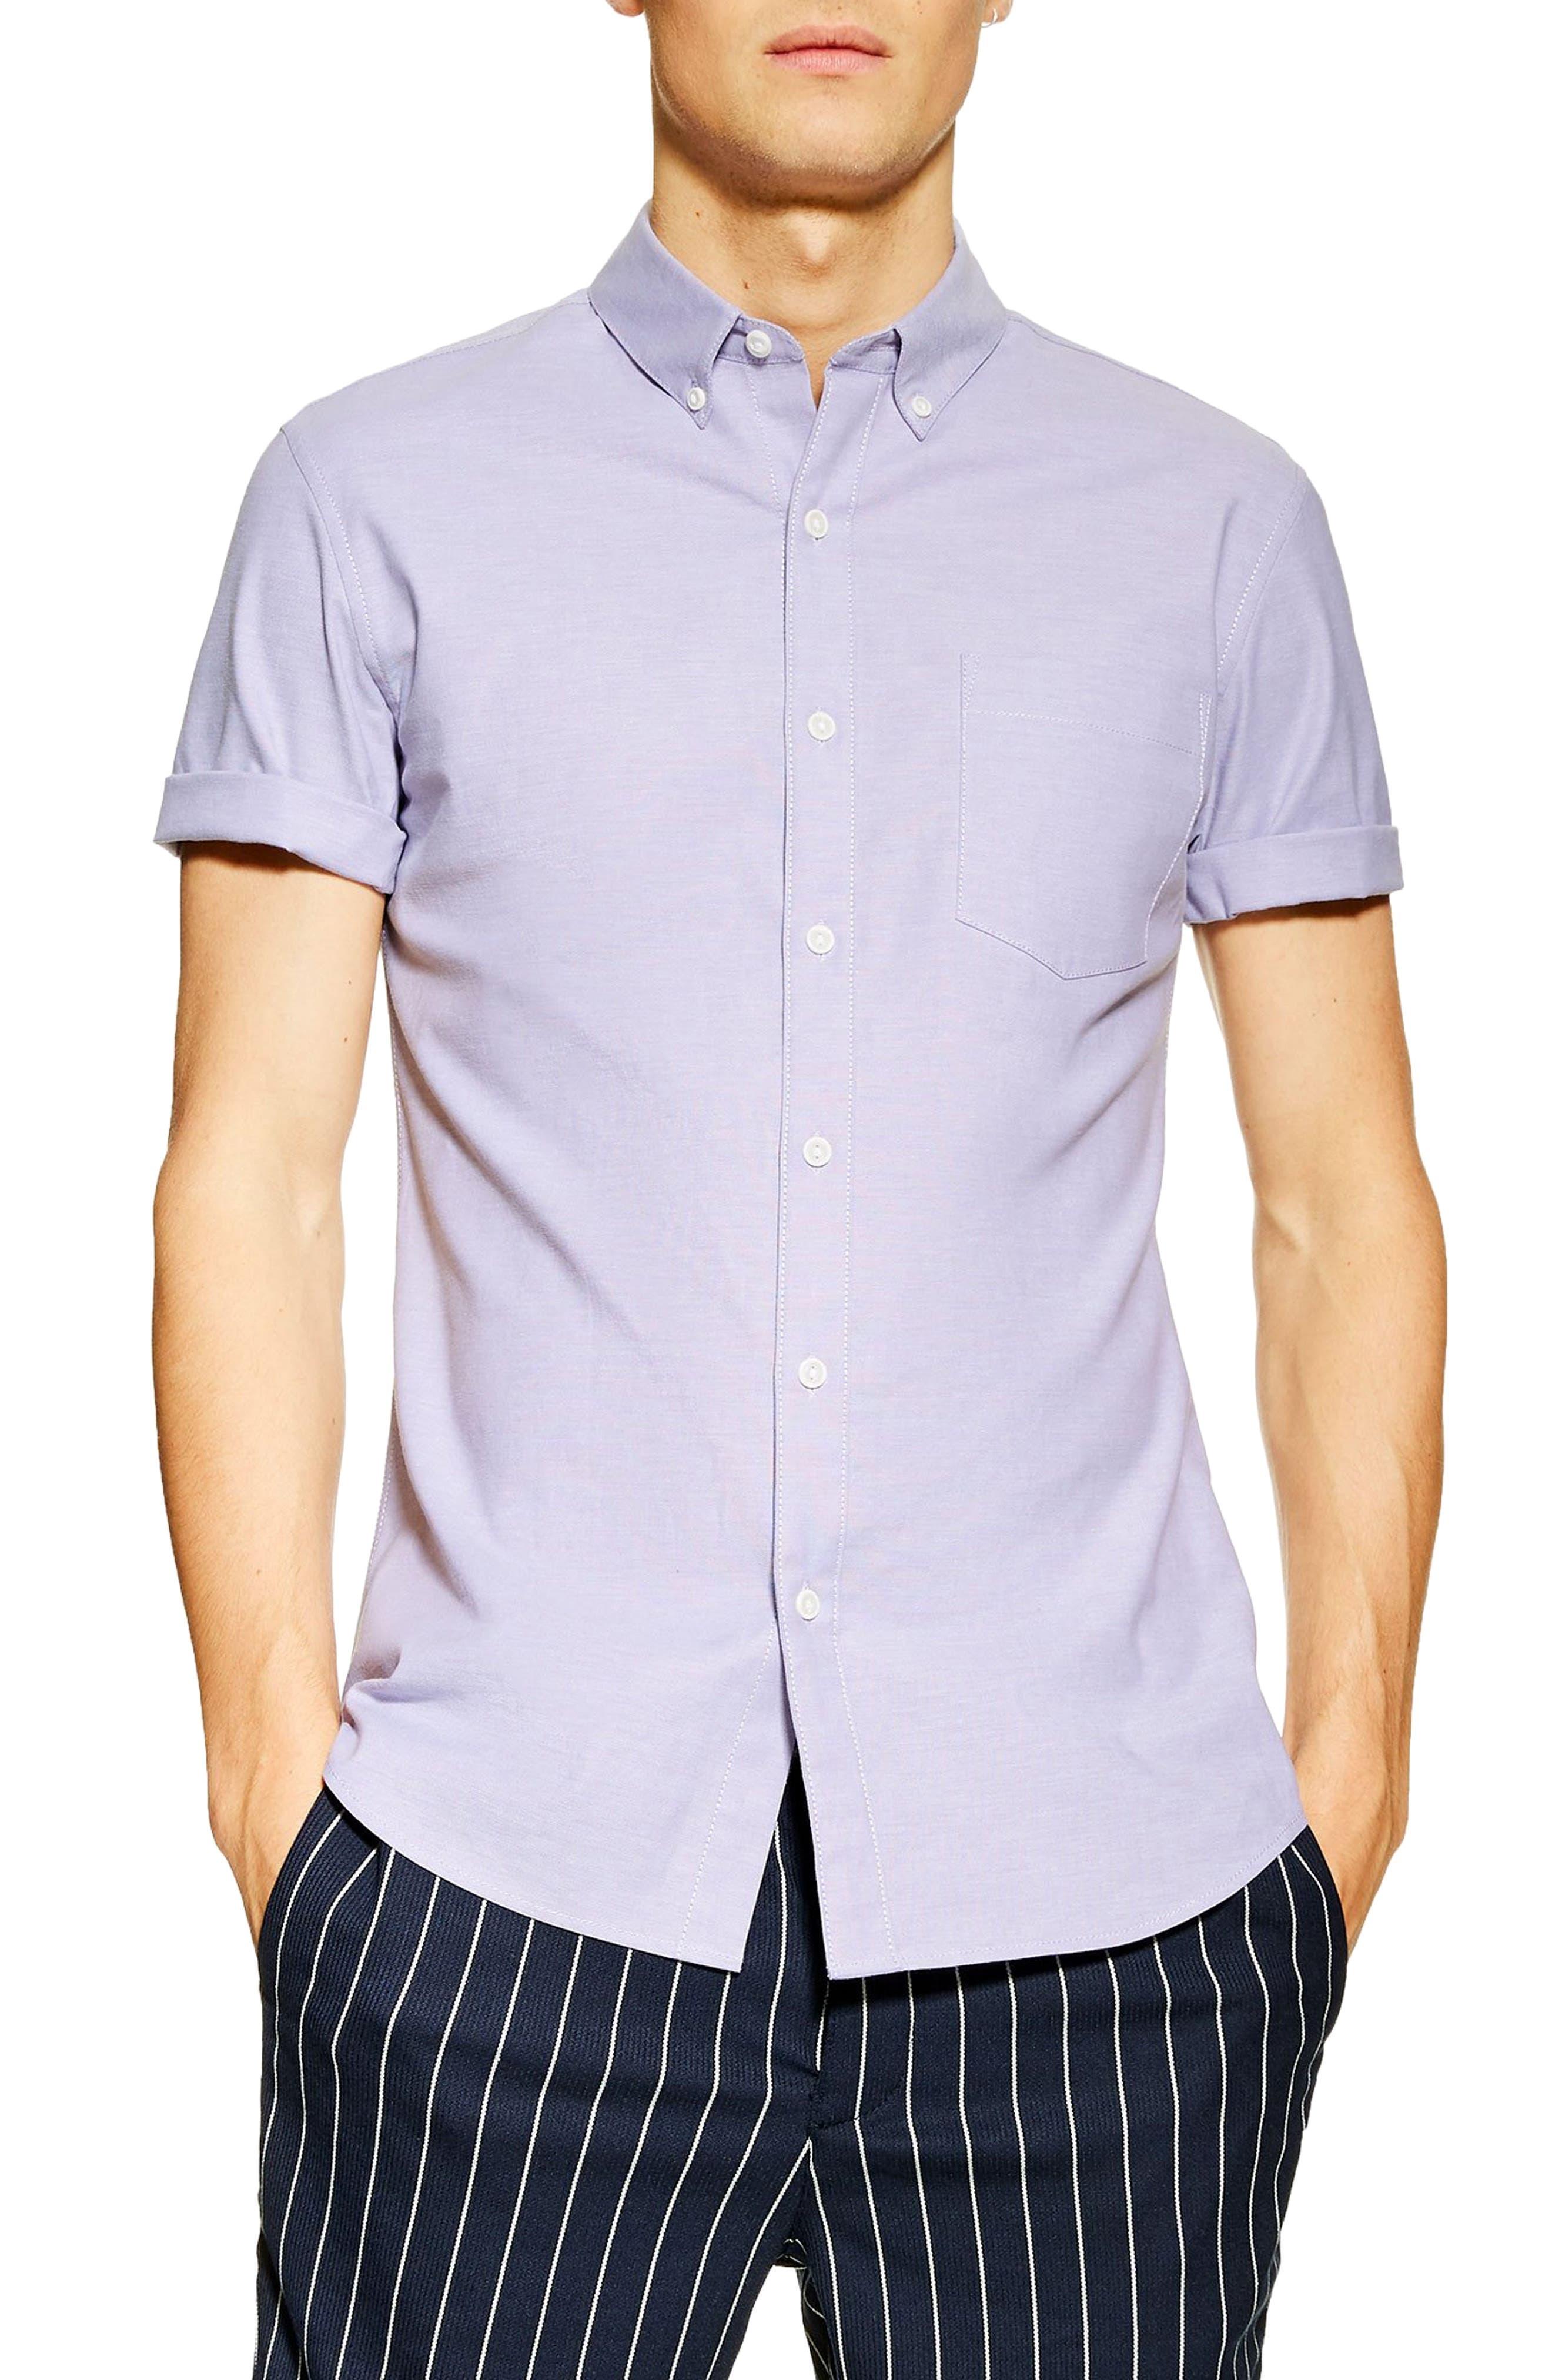 Topman Stretch Solid Sport Shirt, Purple